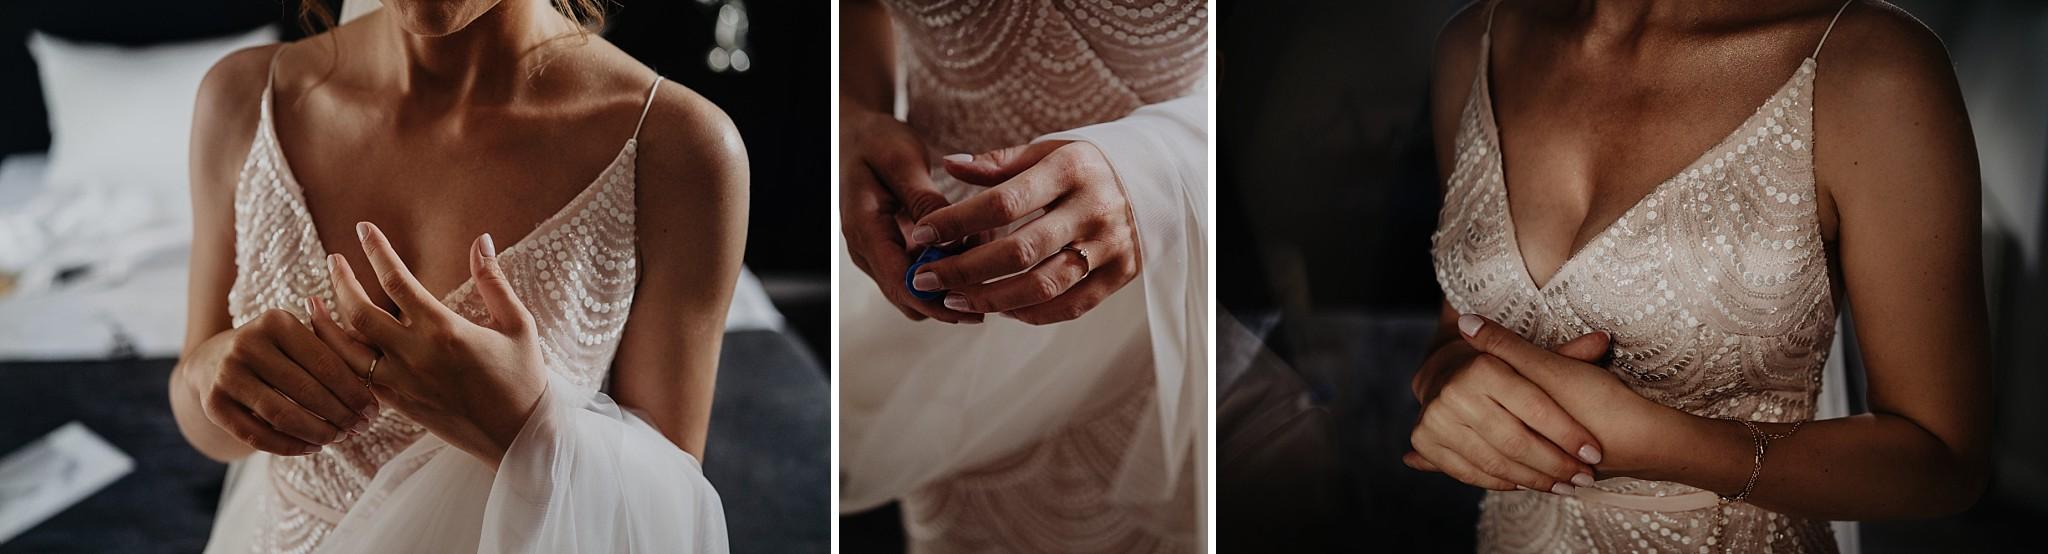 fotograf poznan wesele dobra truskawka piekne wesele pod poznaniem wesele w dobrej truskawce piekna para mloda slub marzen slub koronawirus slub listopad wesele koronawirus 082